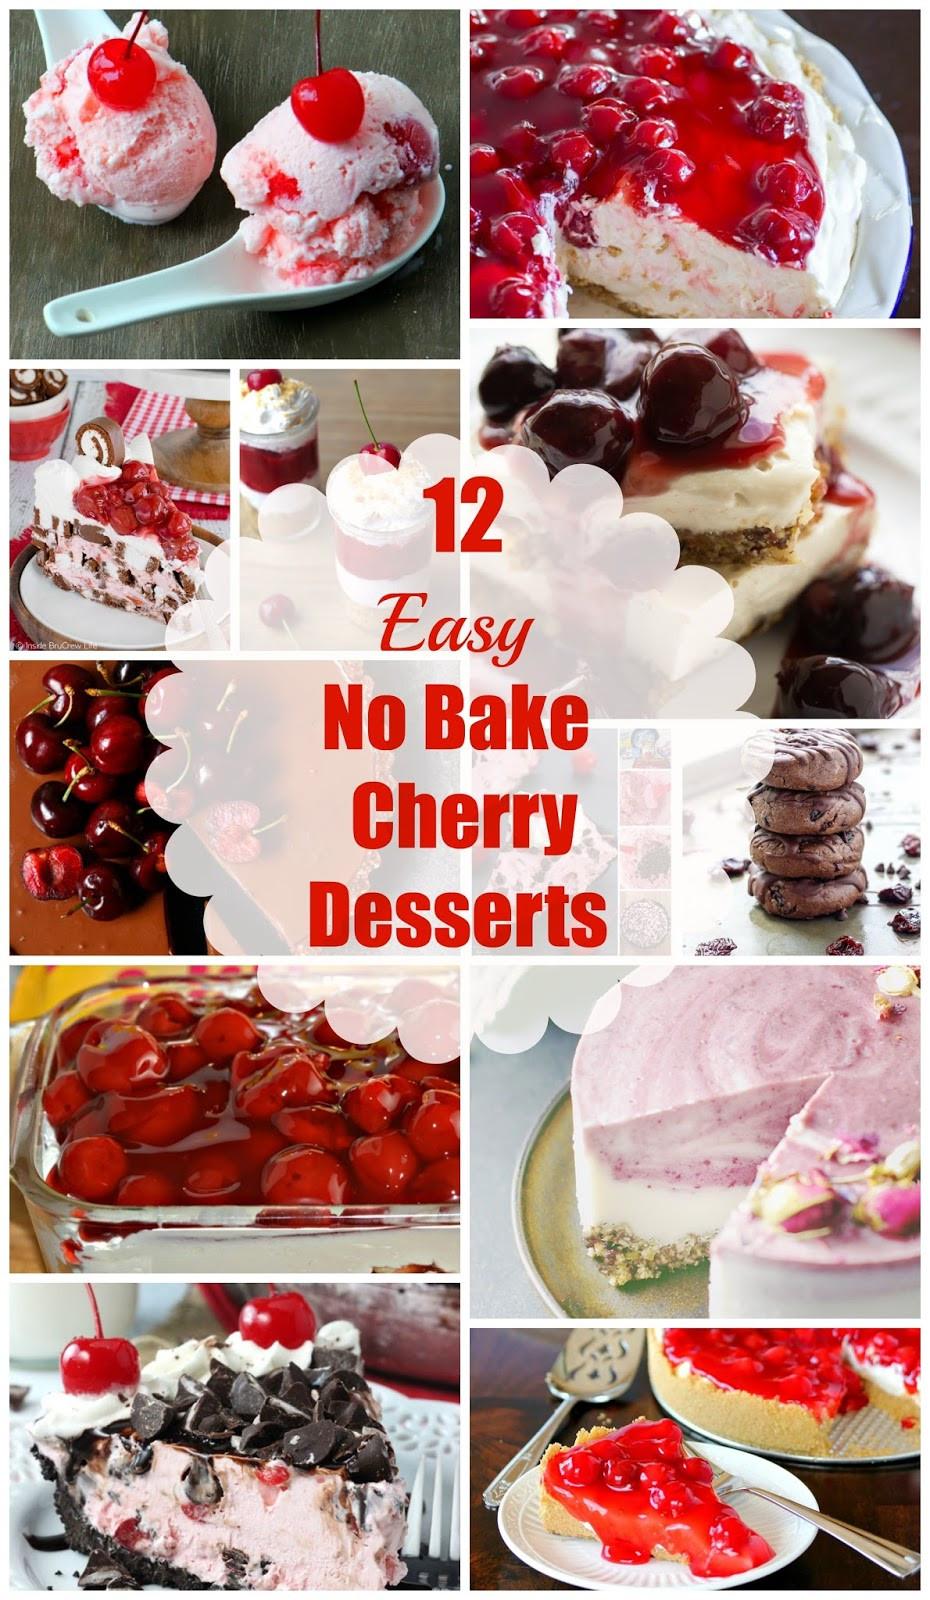 Easy No Bake Desserts  12 Easy No Bake Cherry Desserts Manila Spoon